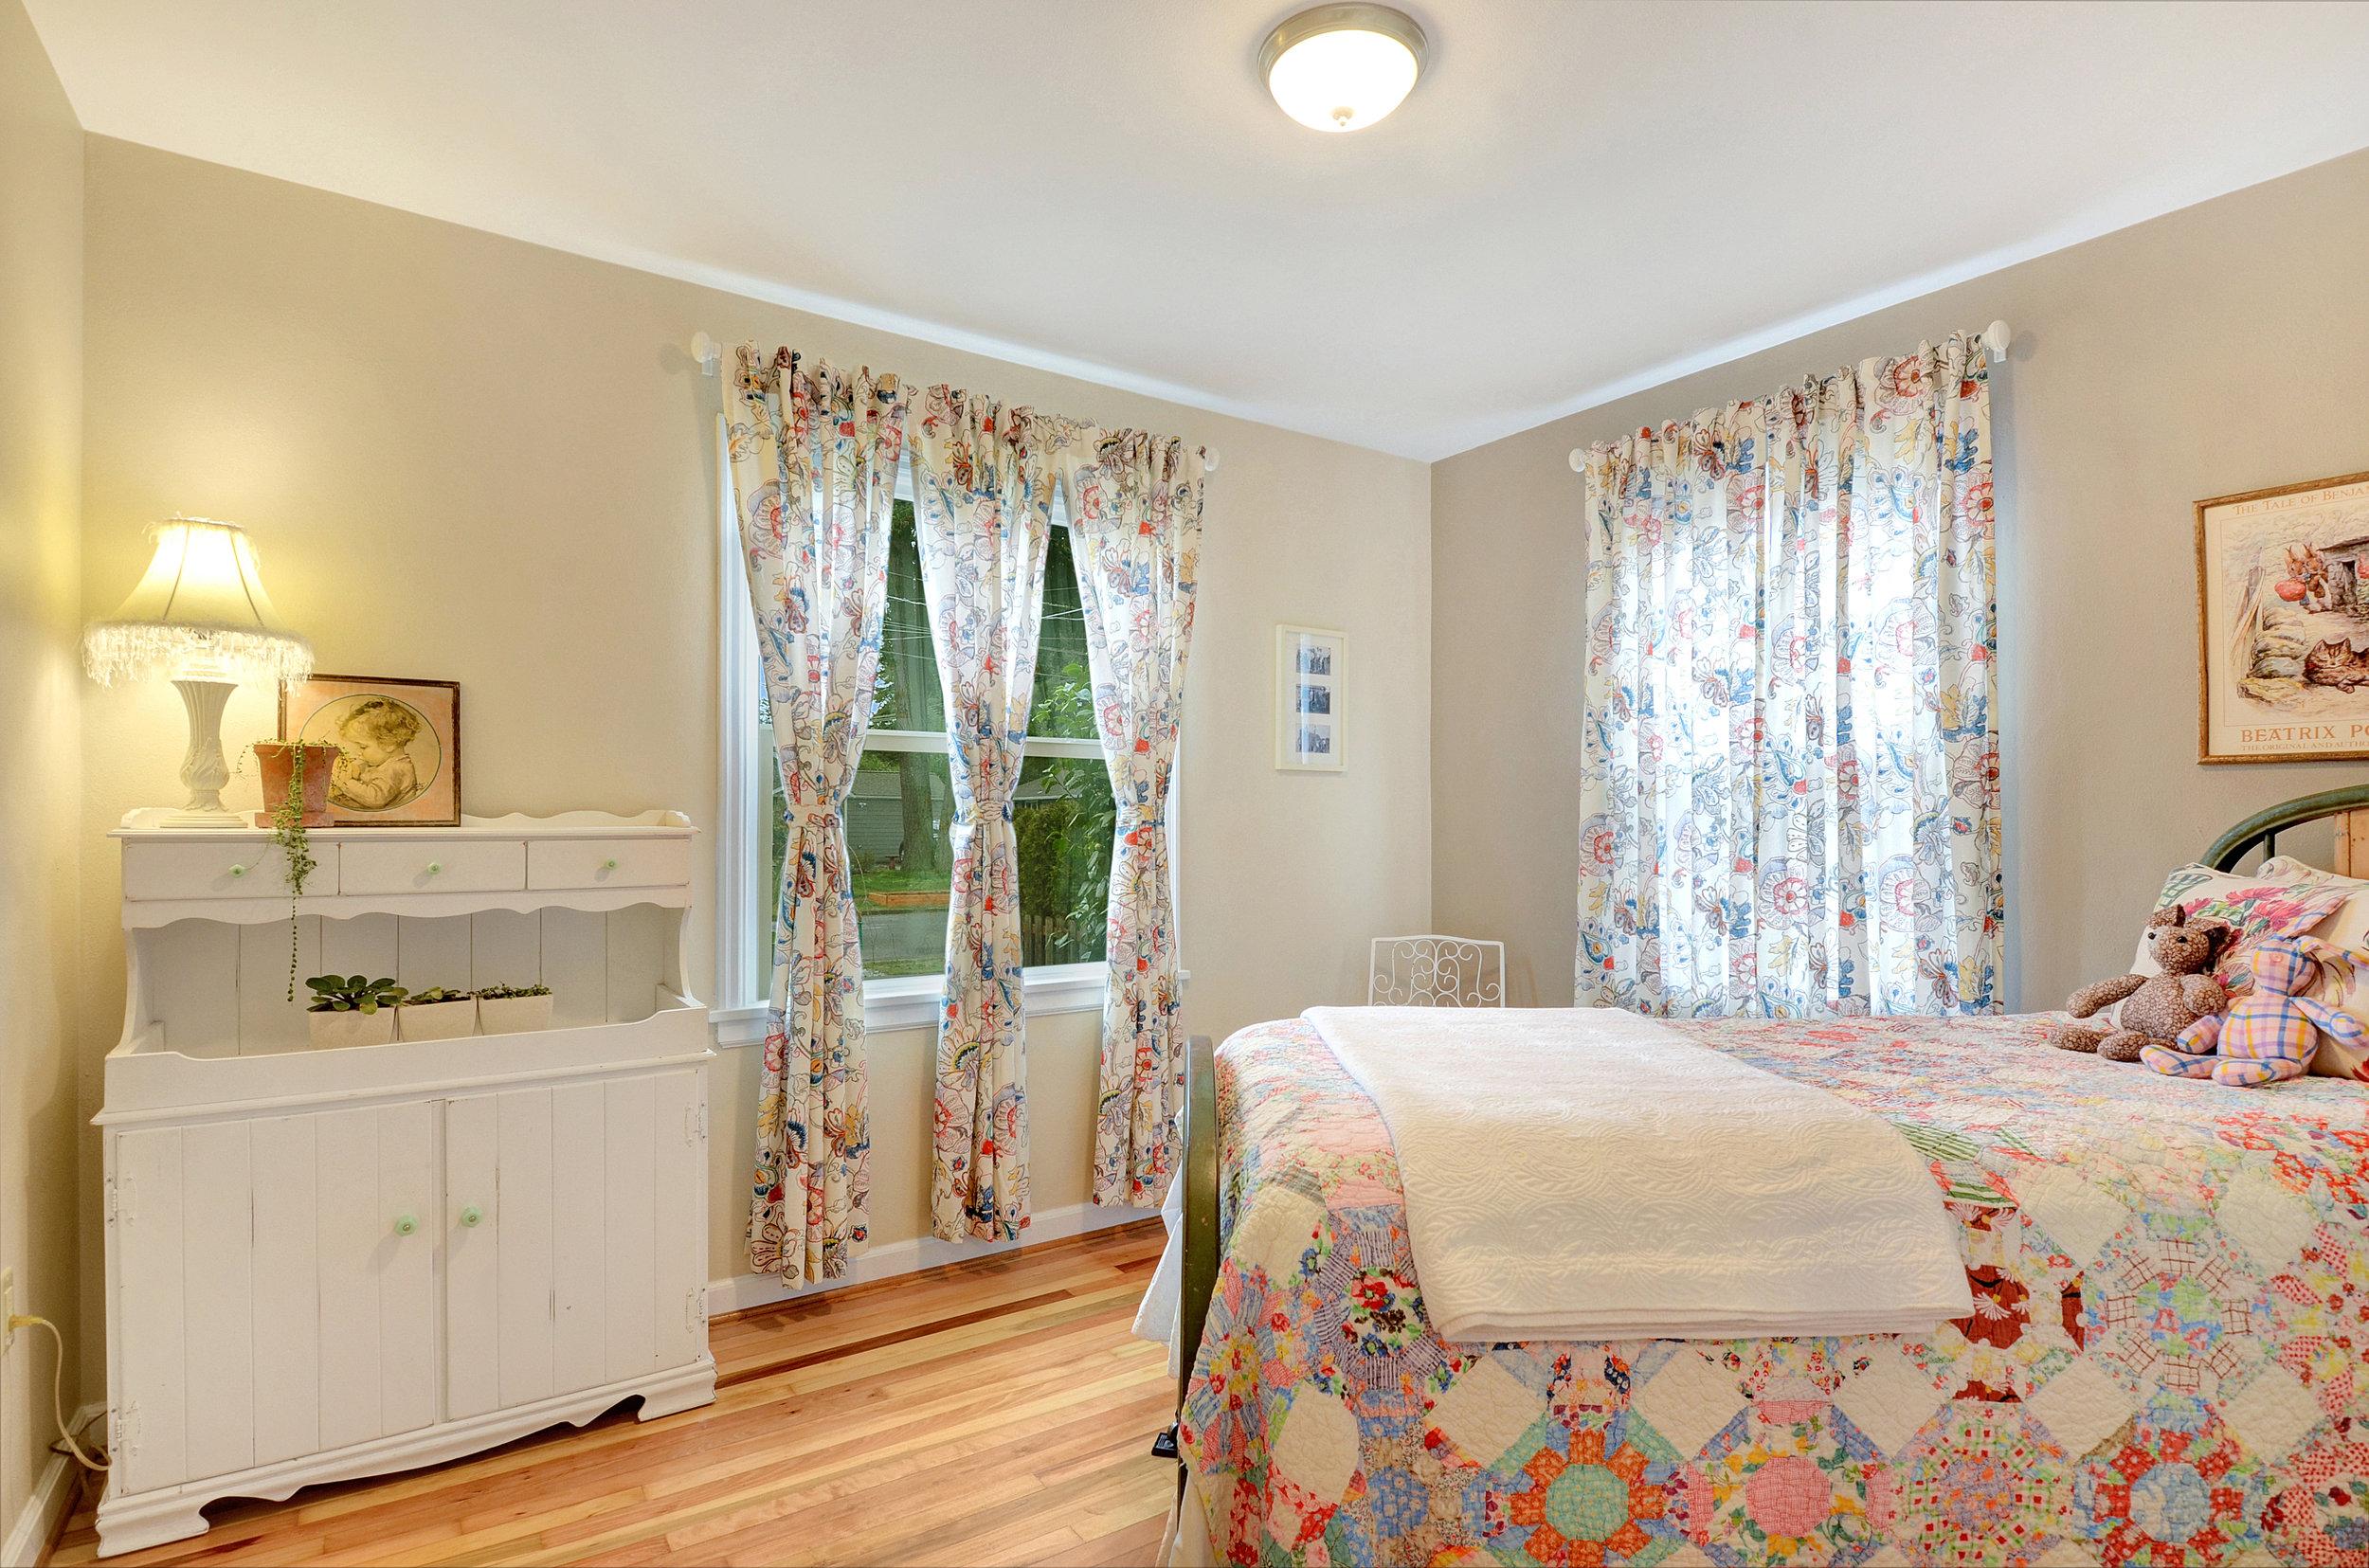 Fresh interior paint, good lighting, and beautiful wooden floors create cozy bedrooms.